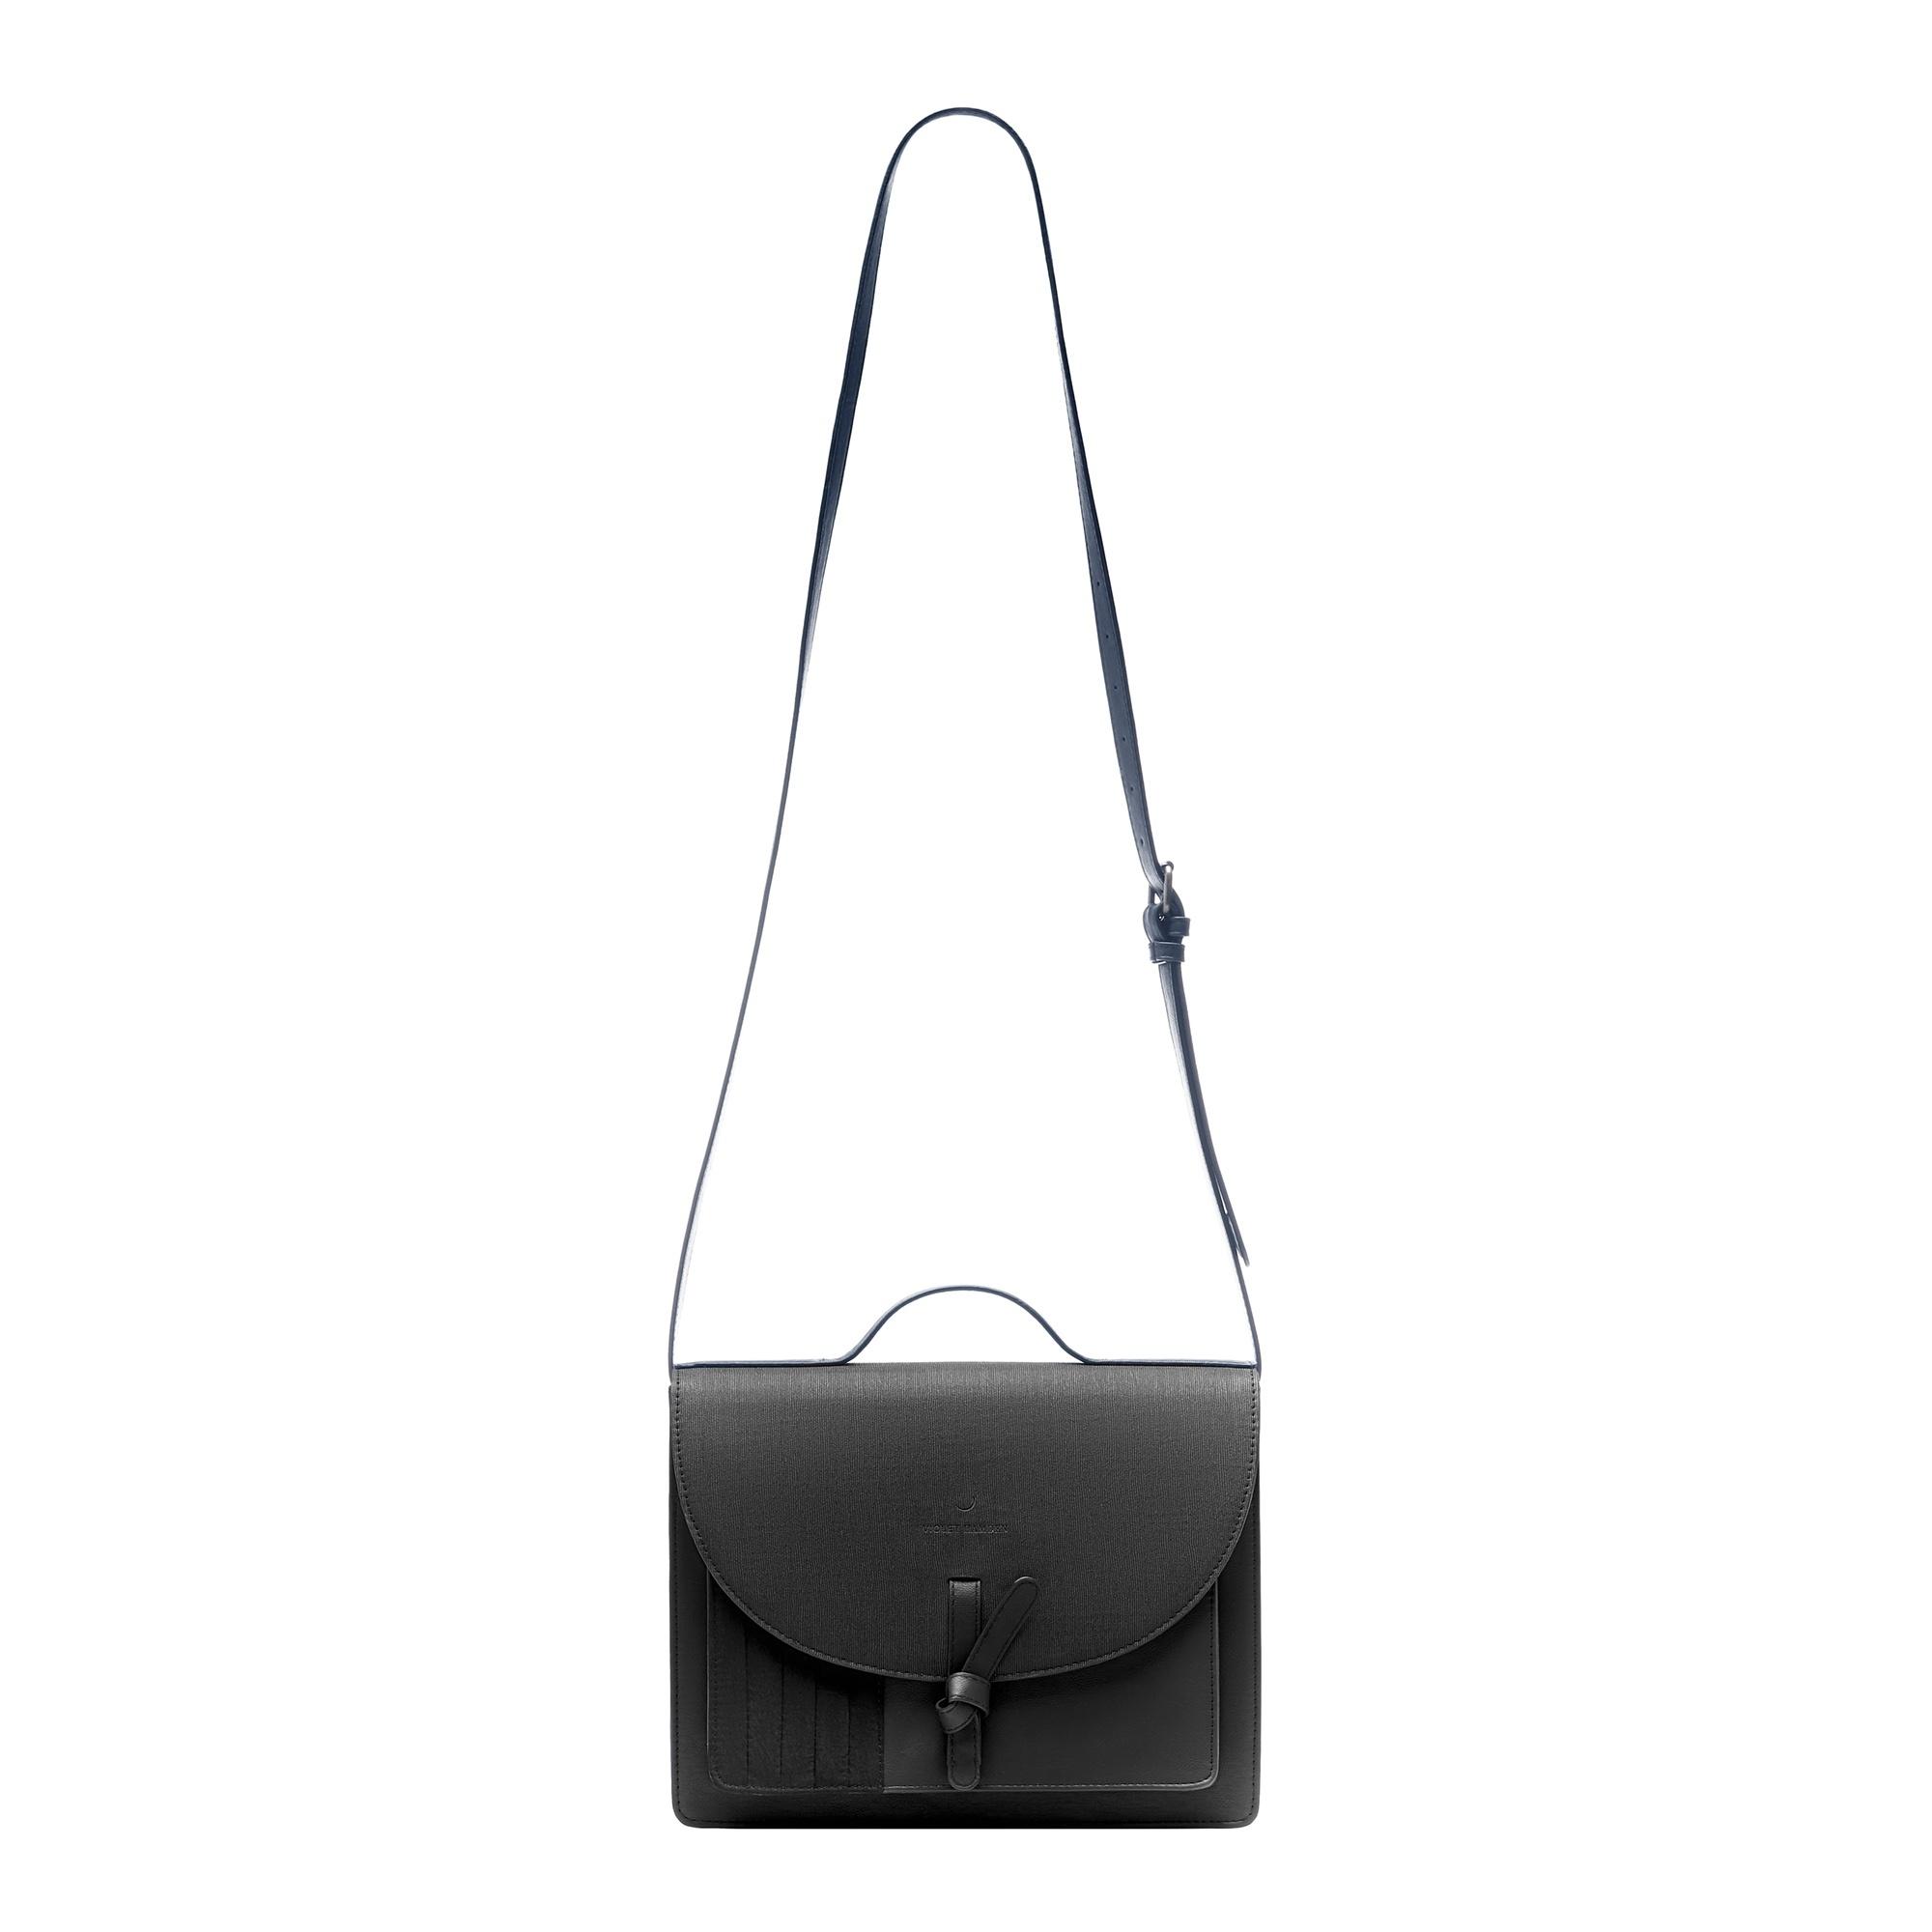 Violet Hamden Essential Bag black crossbody